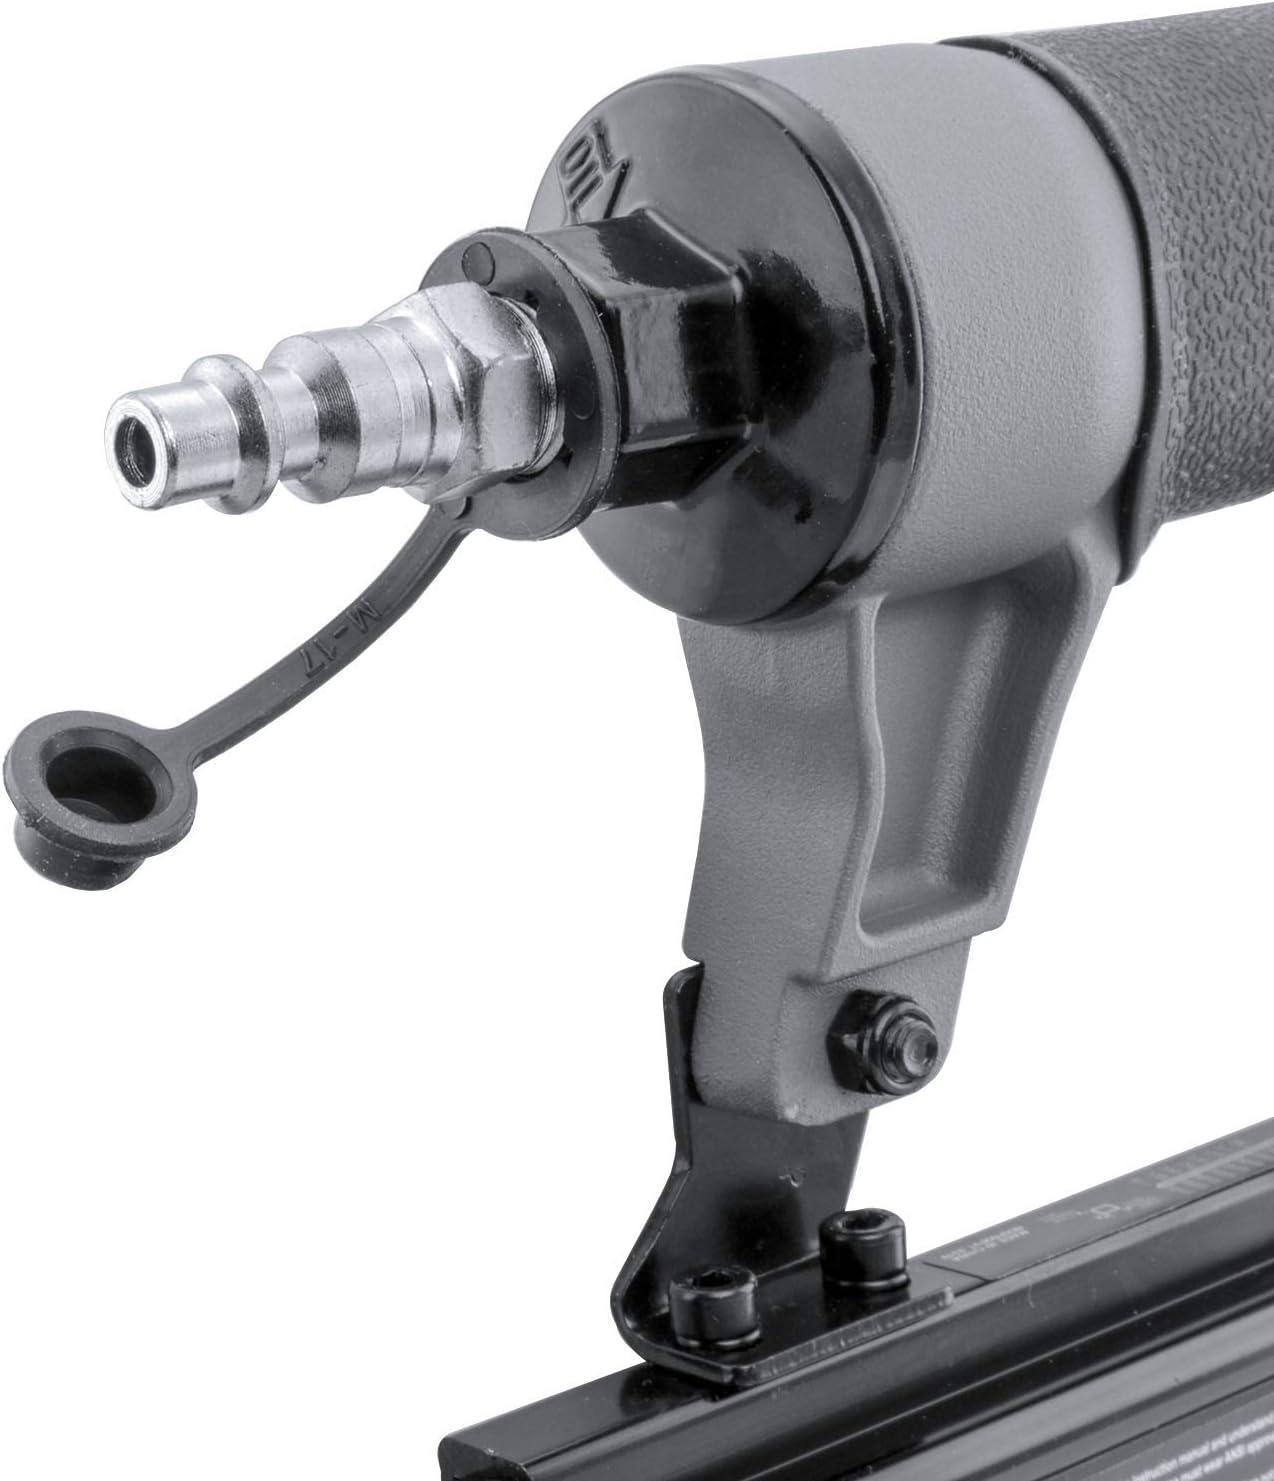 NuMax SBR50 Pneumatic 18-Gauge 2